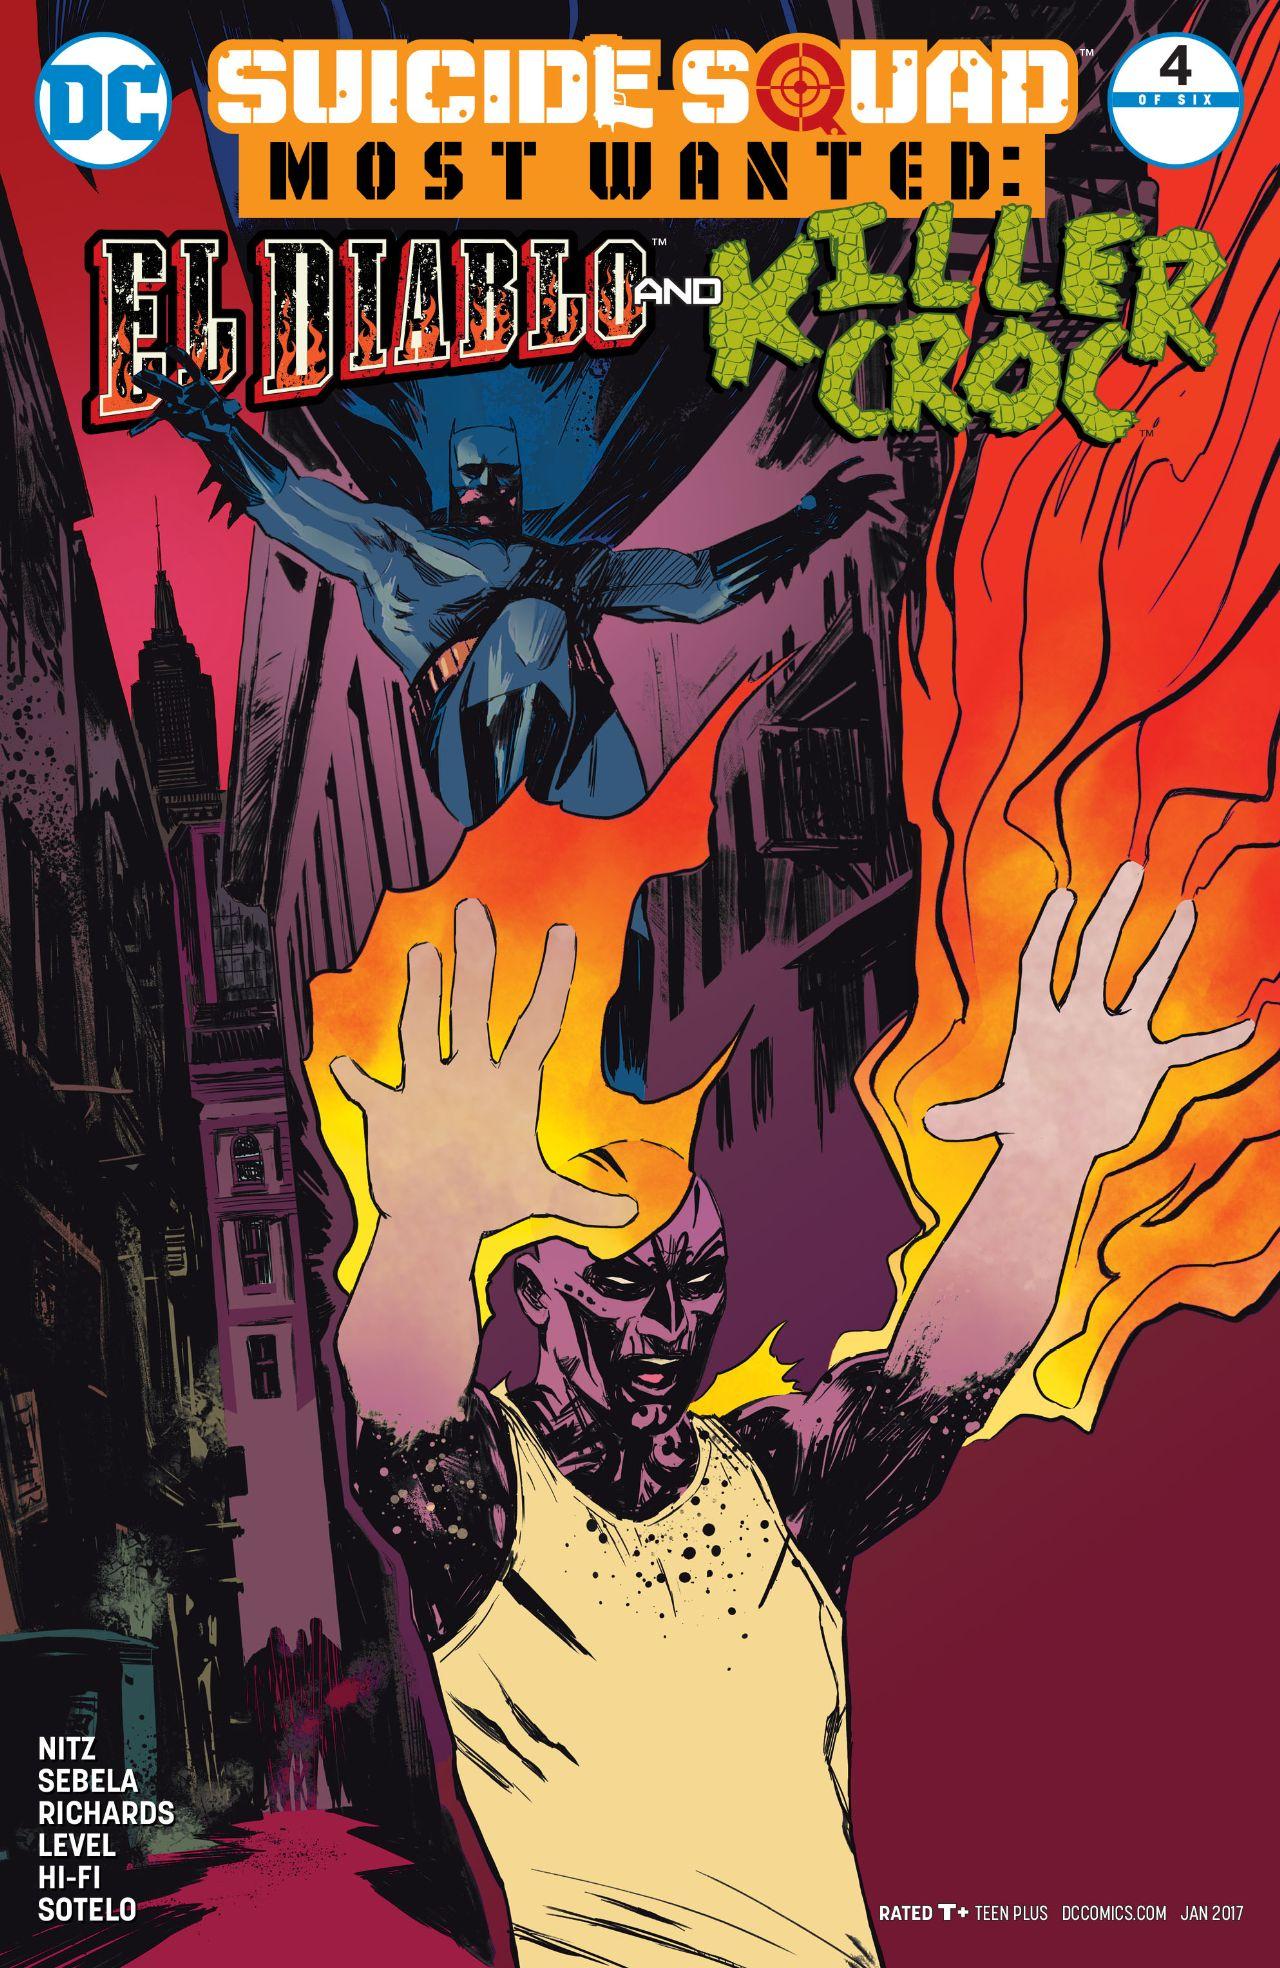 Suicide Squad Most Wanted: El Diablo and Killer Croc Vol 1 4